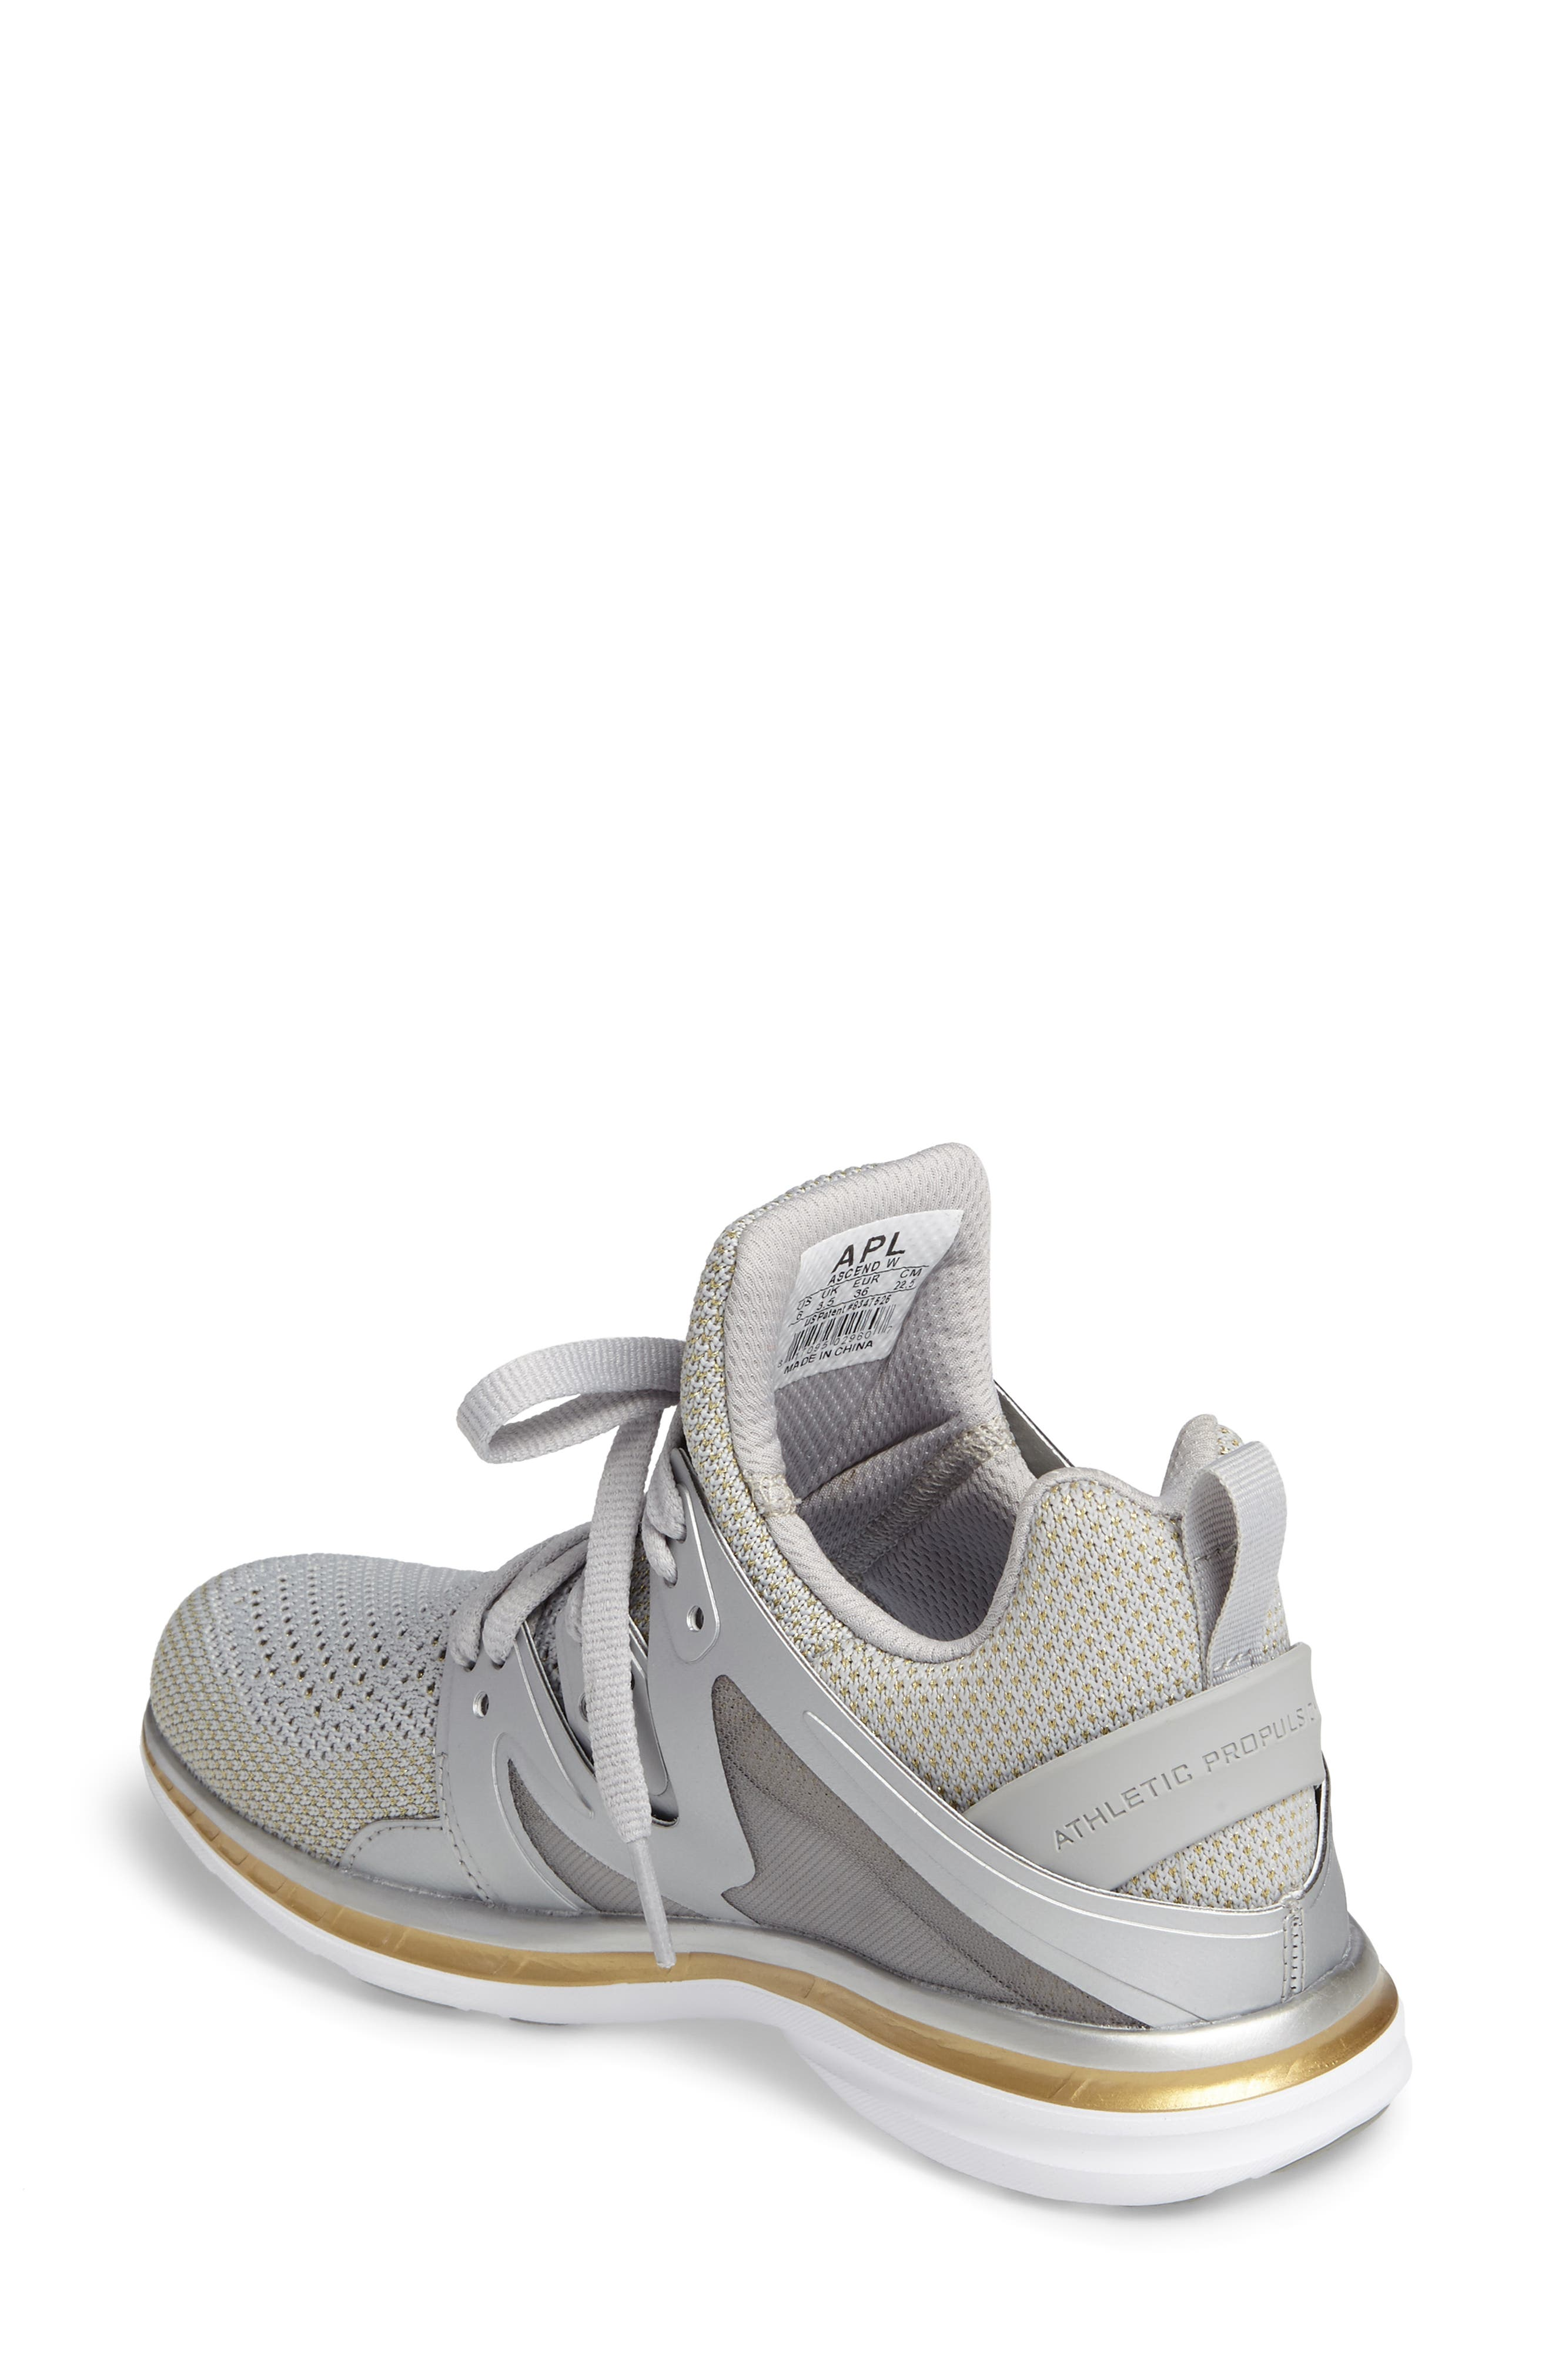 Alternate Image 2  - APL 'Ascend' Training Shoe (Women)